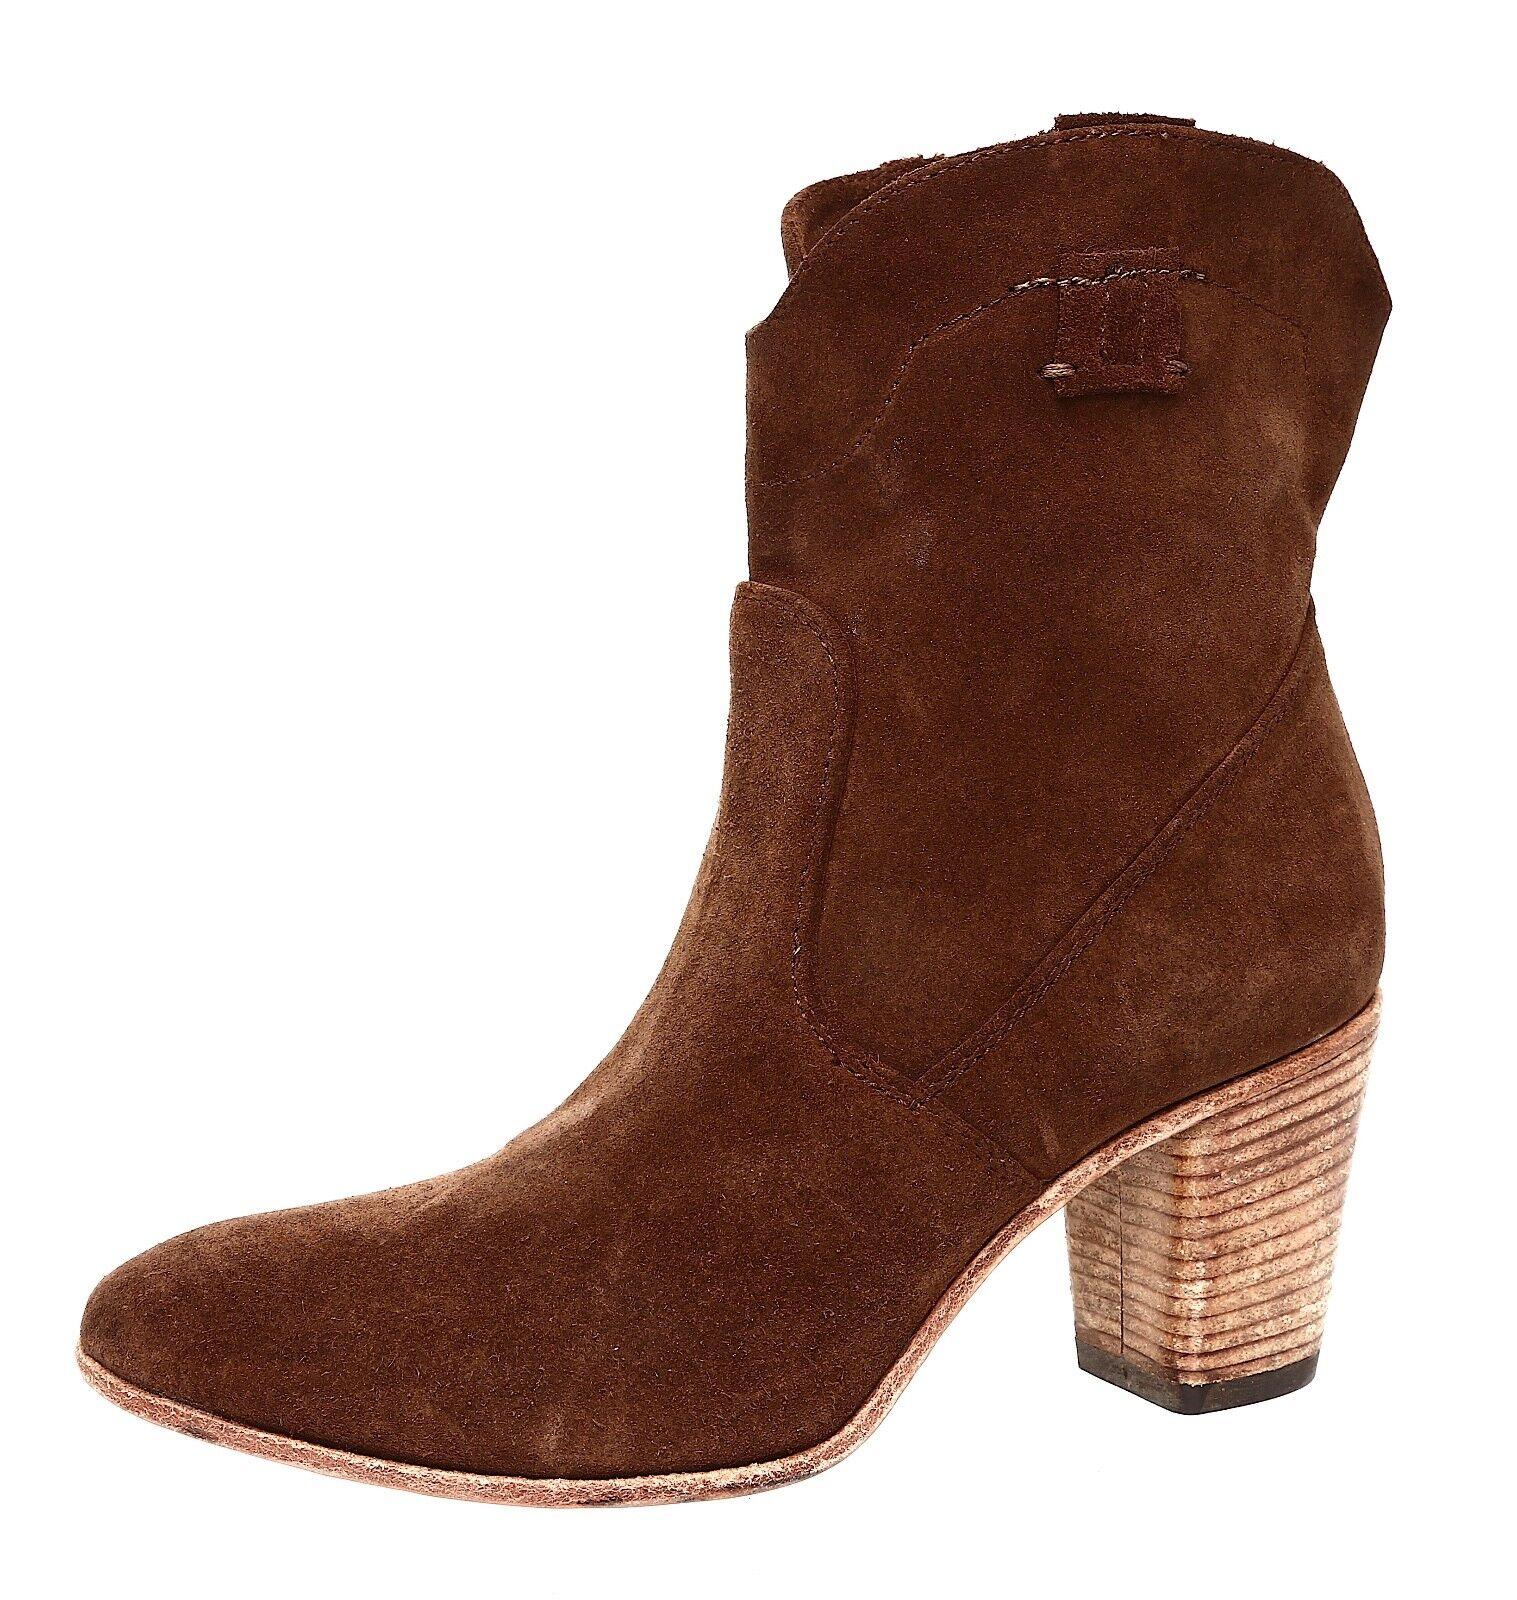 Alberto Fermani Chiara Slouchy Suede Ankle Boot Brown Women Sz 35 *